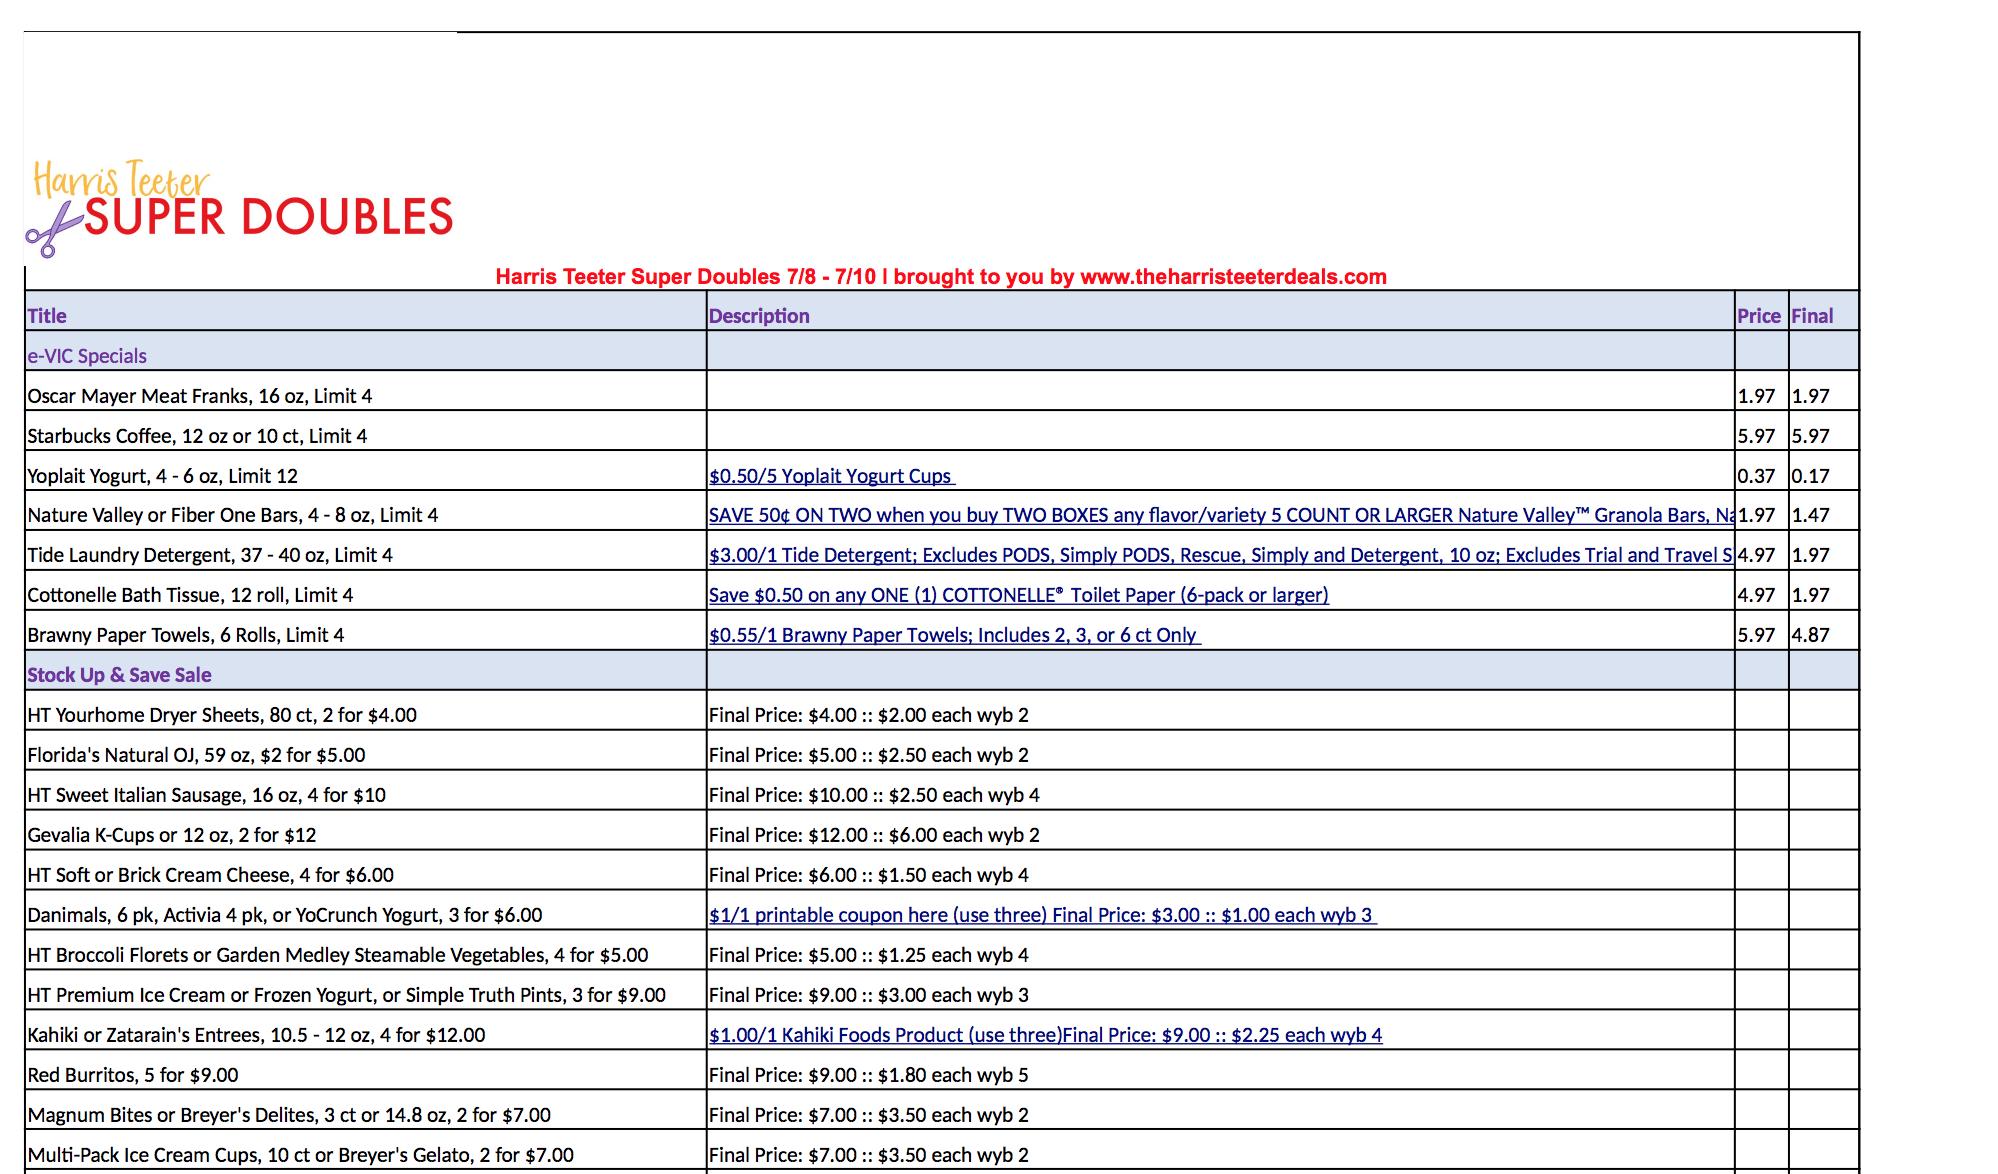 Harris Teeter Coupon Spreadsheet With Regard To Harris Teeter Super Doubles Spreadsheet 7/8  7/10  The Harris